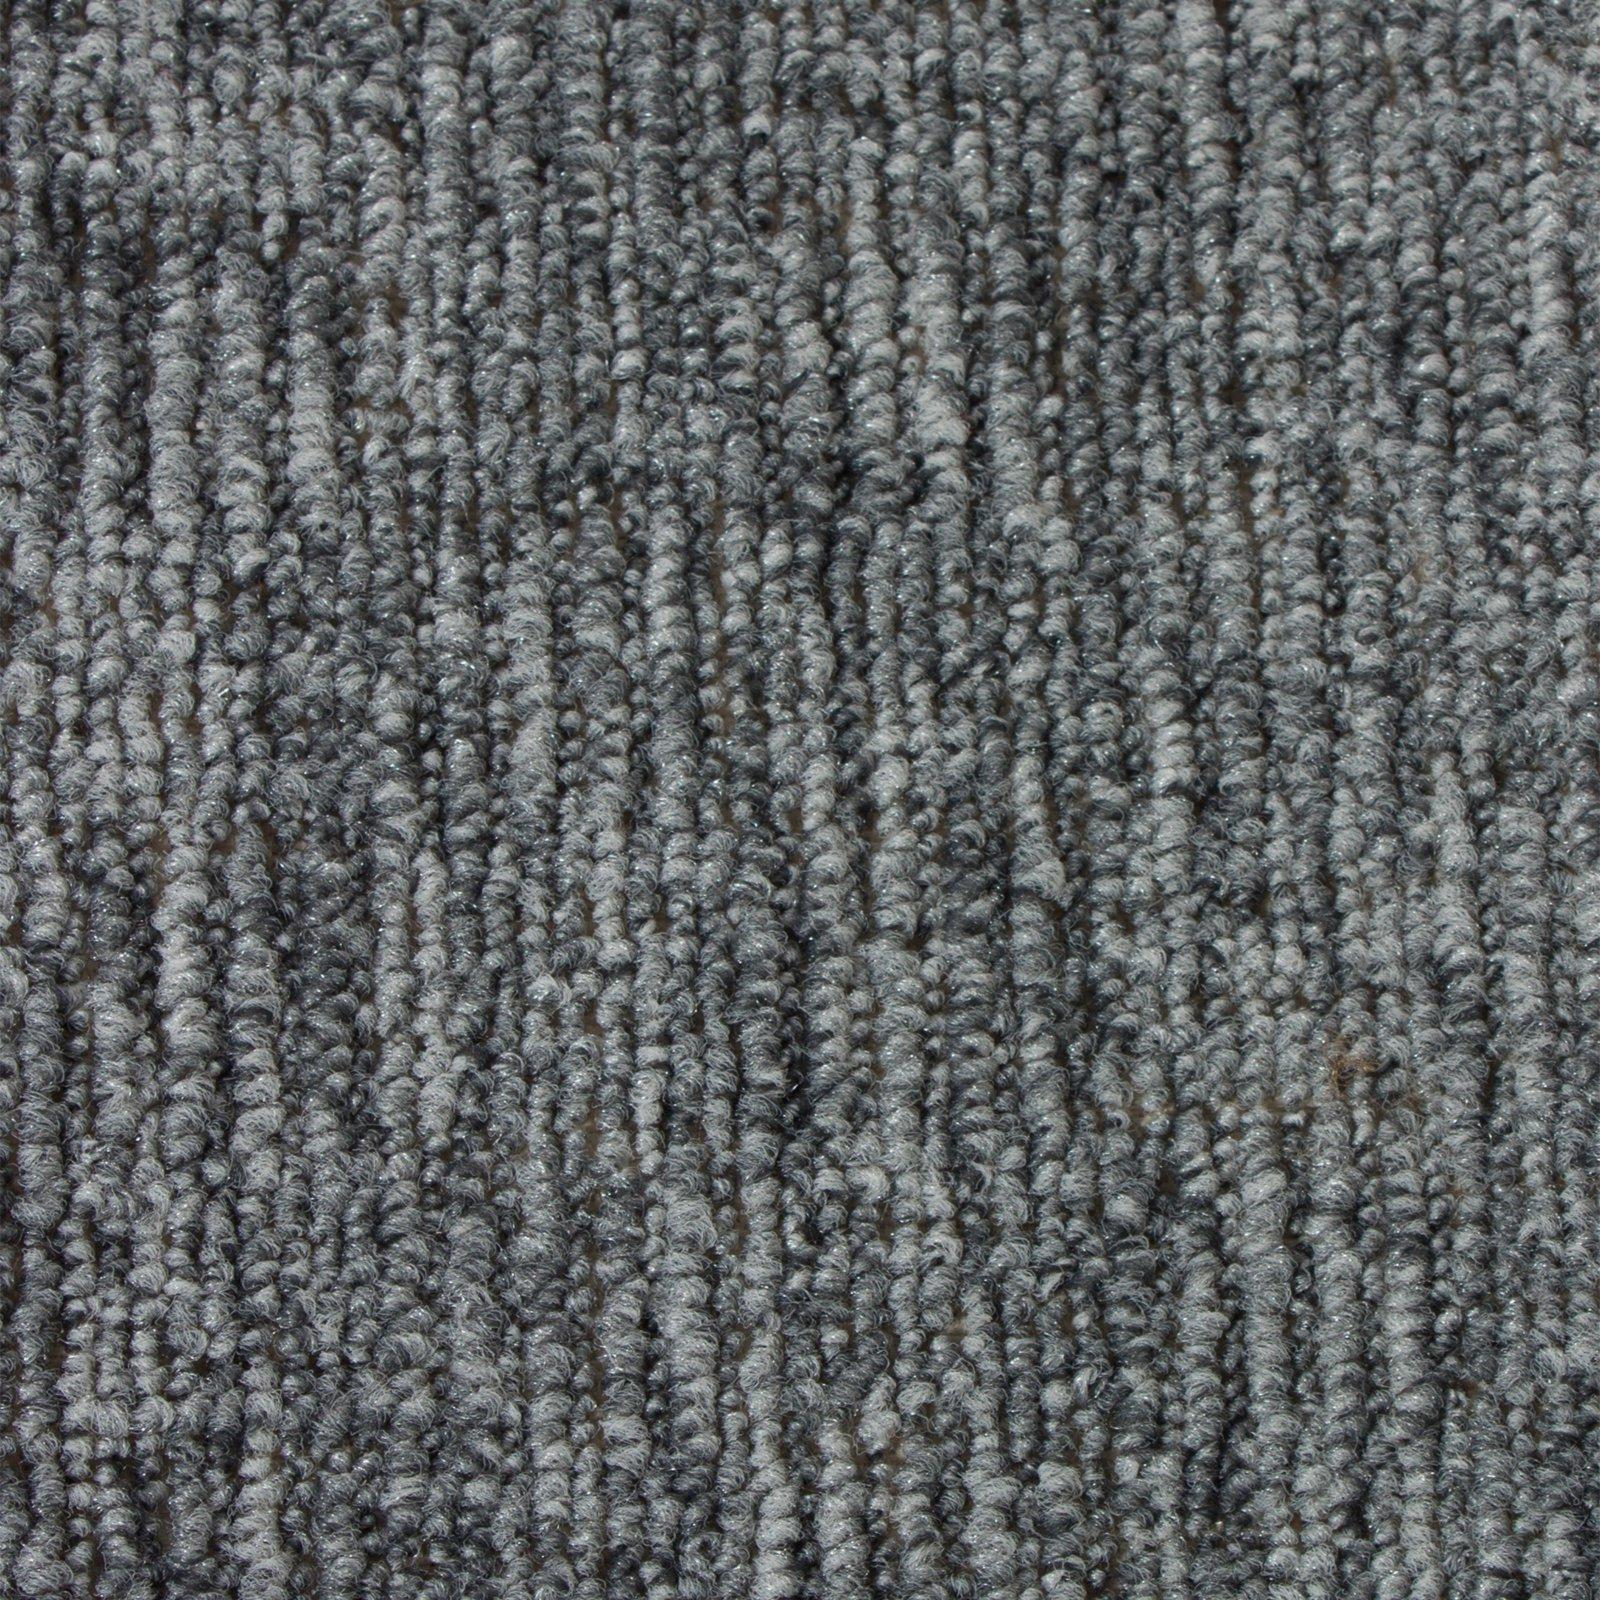 teppichboden troje grau 5 meter breit teppichboden bodenbel ge renovieren roller. Black Bedroom Furniture Sets. Home Design Ideas